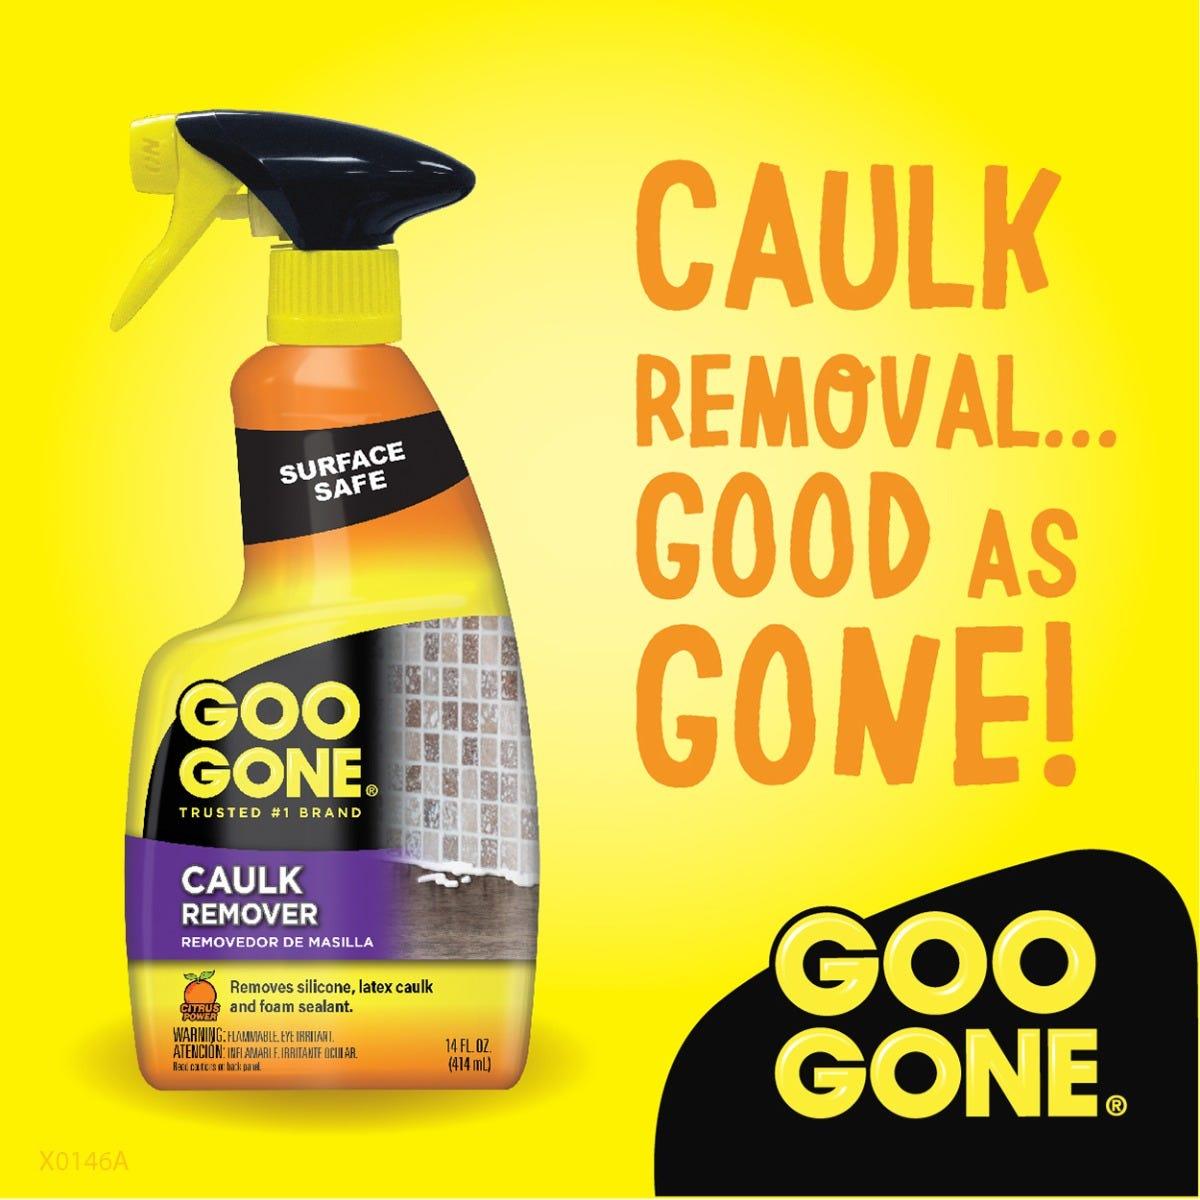 https://googone.com/media/catalog/product/c/a/caulk_remover_beauty.jpg